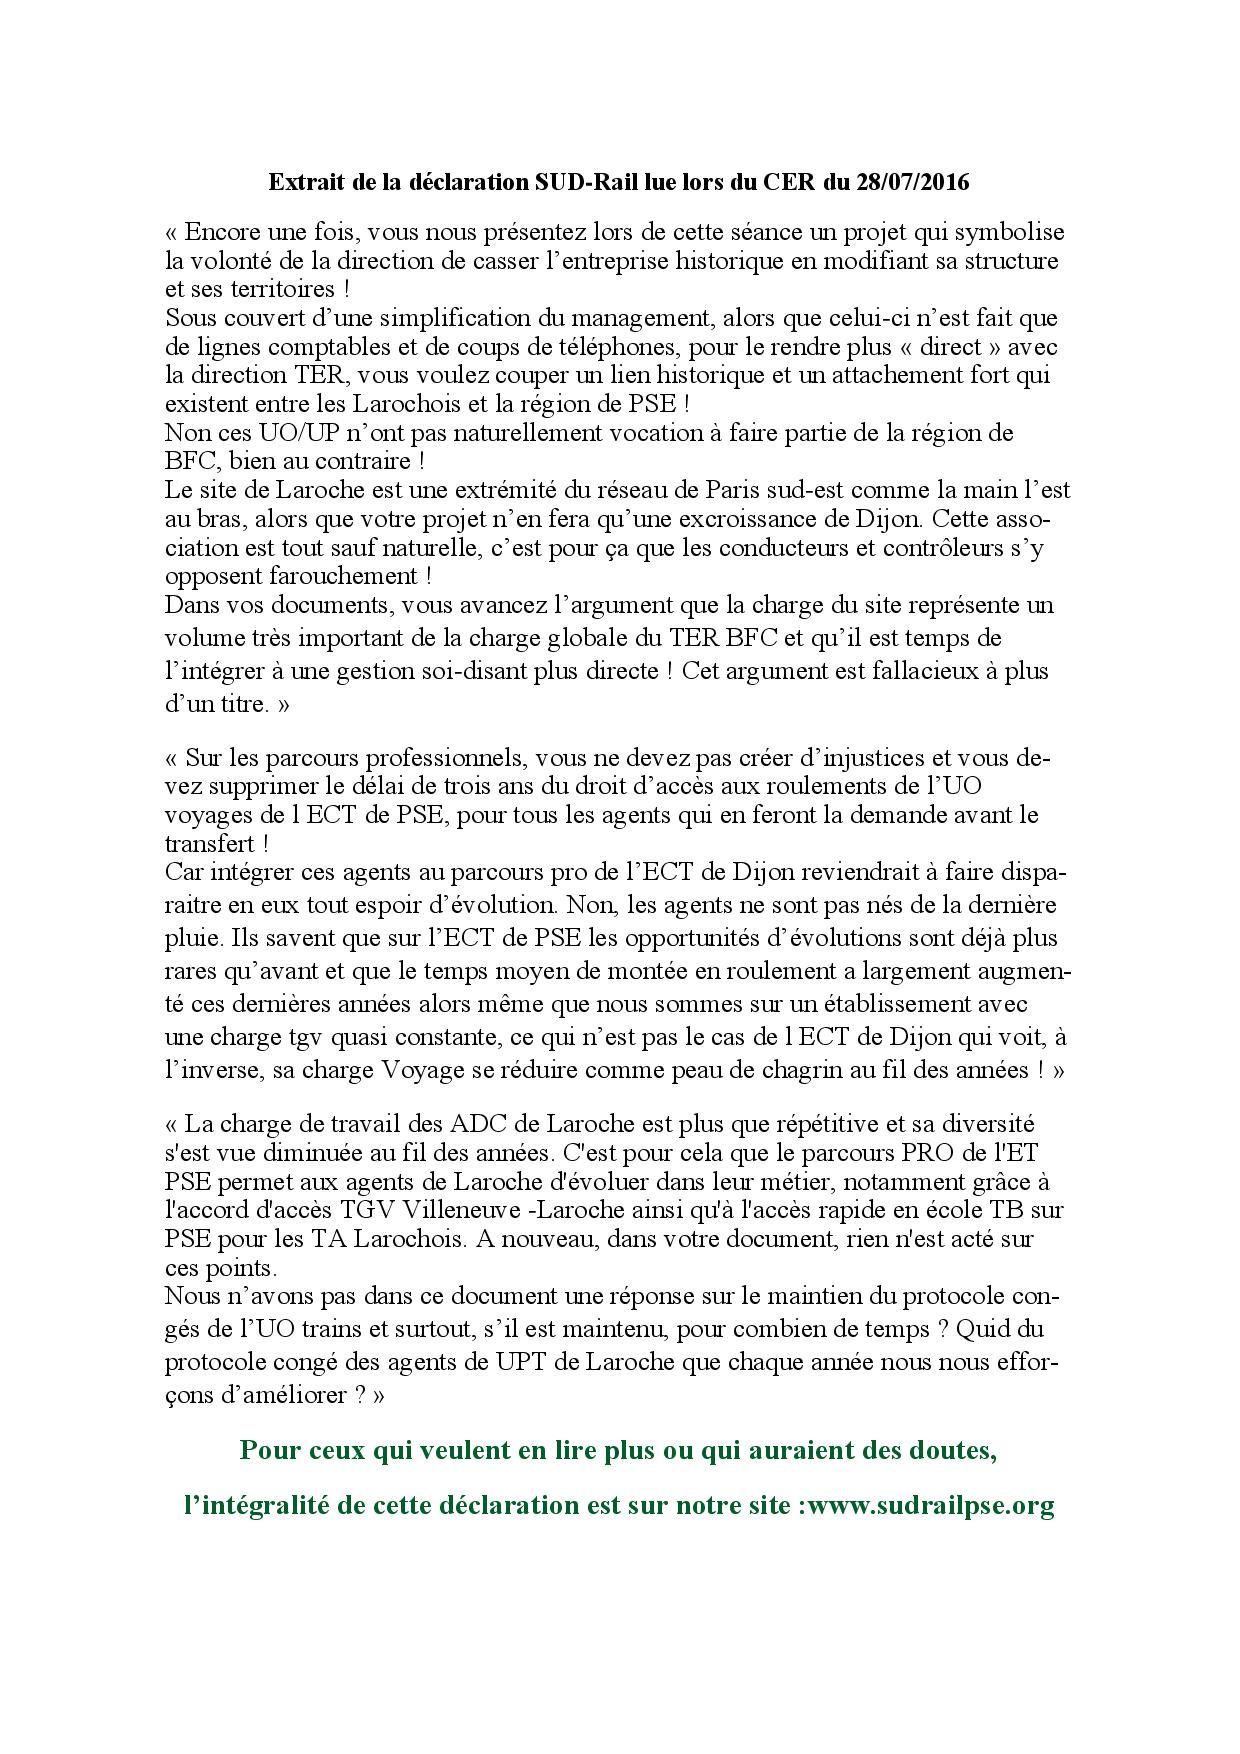 Rattachement Laroche Reponse a la cfdt-page-002